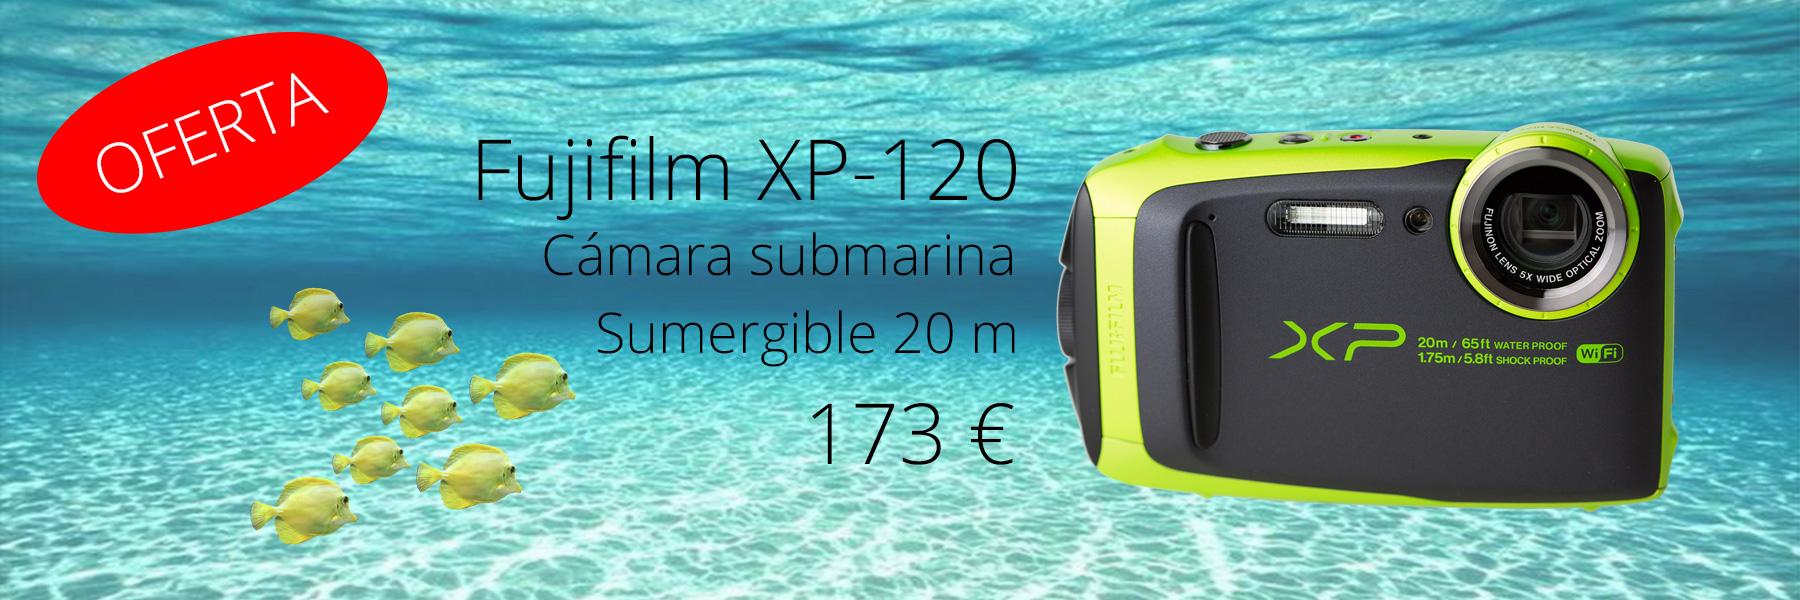 FUJIFILM XP120 OFERTA